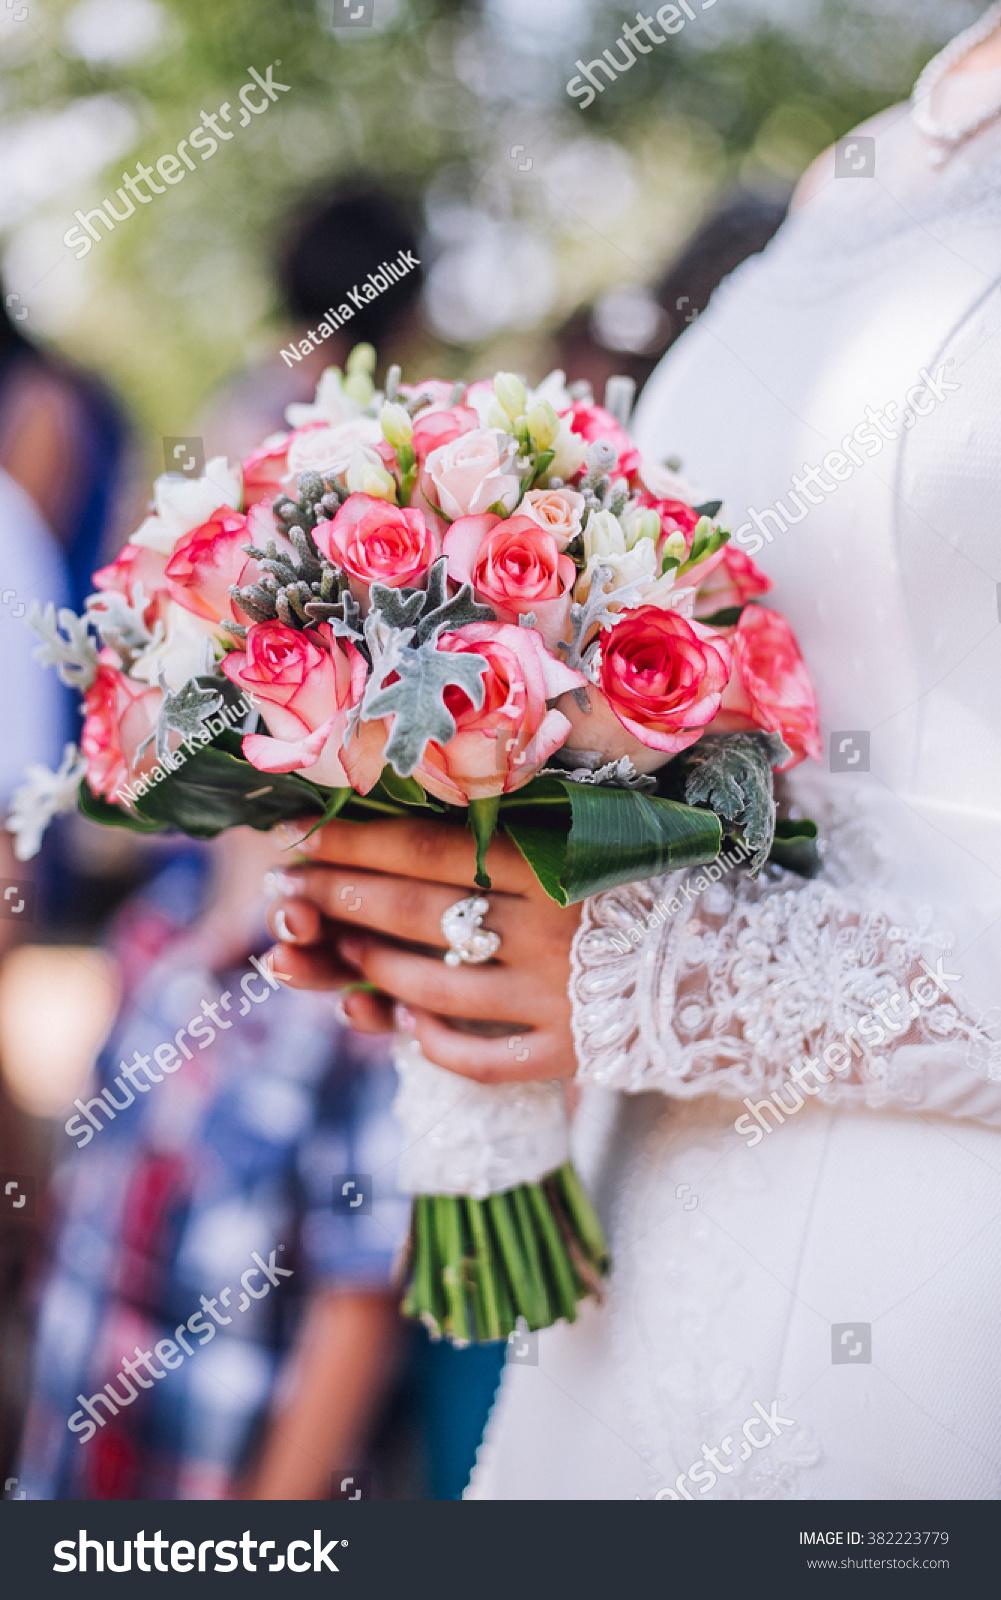 Impressive Beautiful Wedding Flowers Candy Bar Stock Photo (Royalty ...